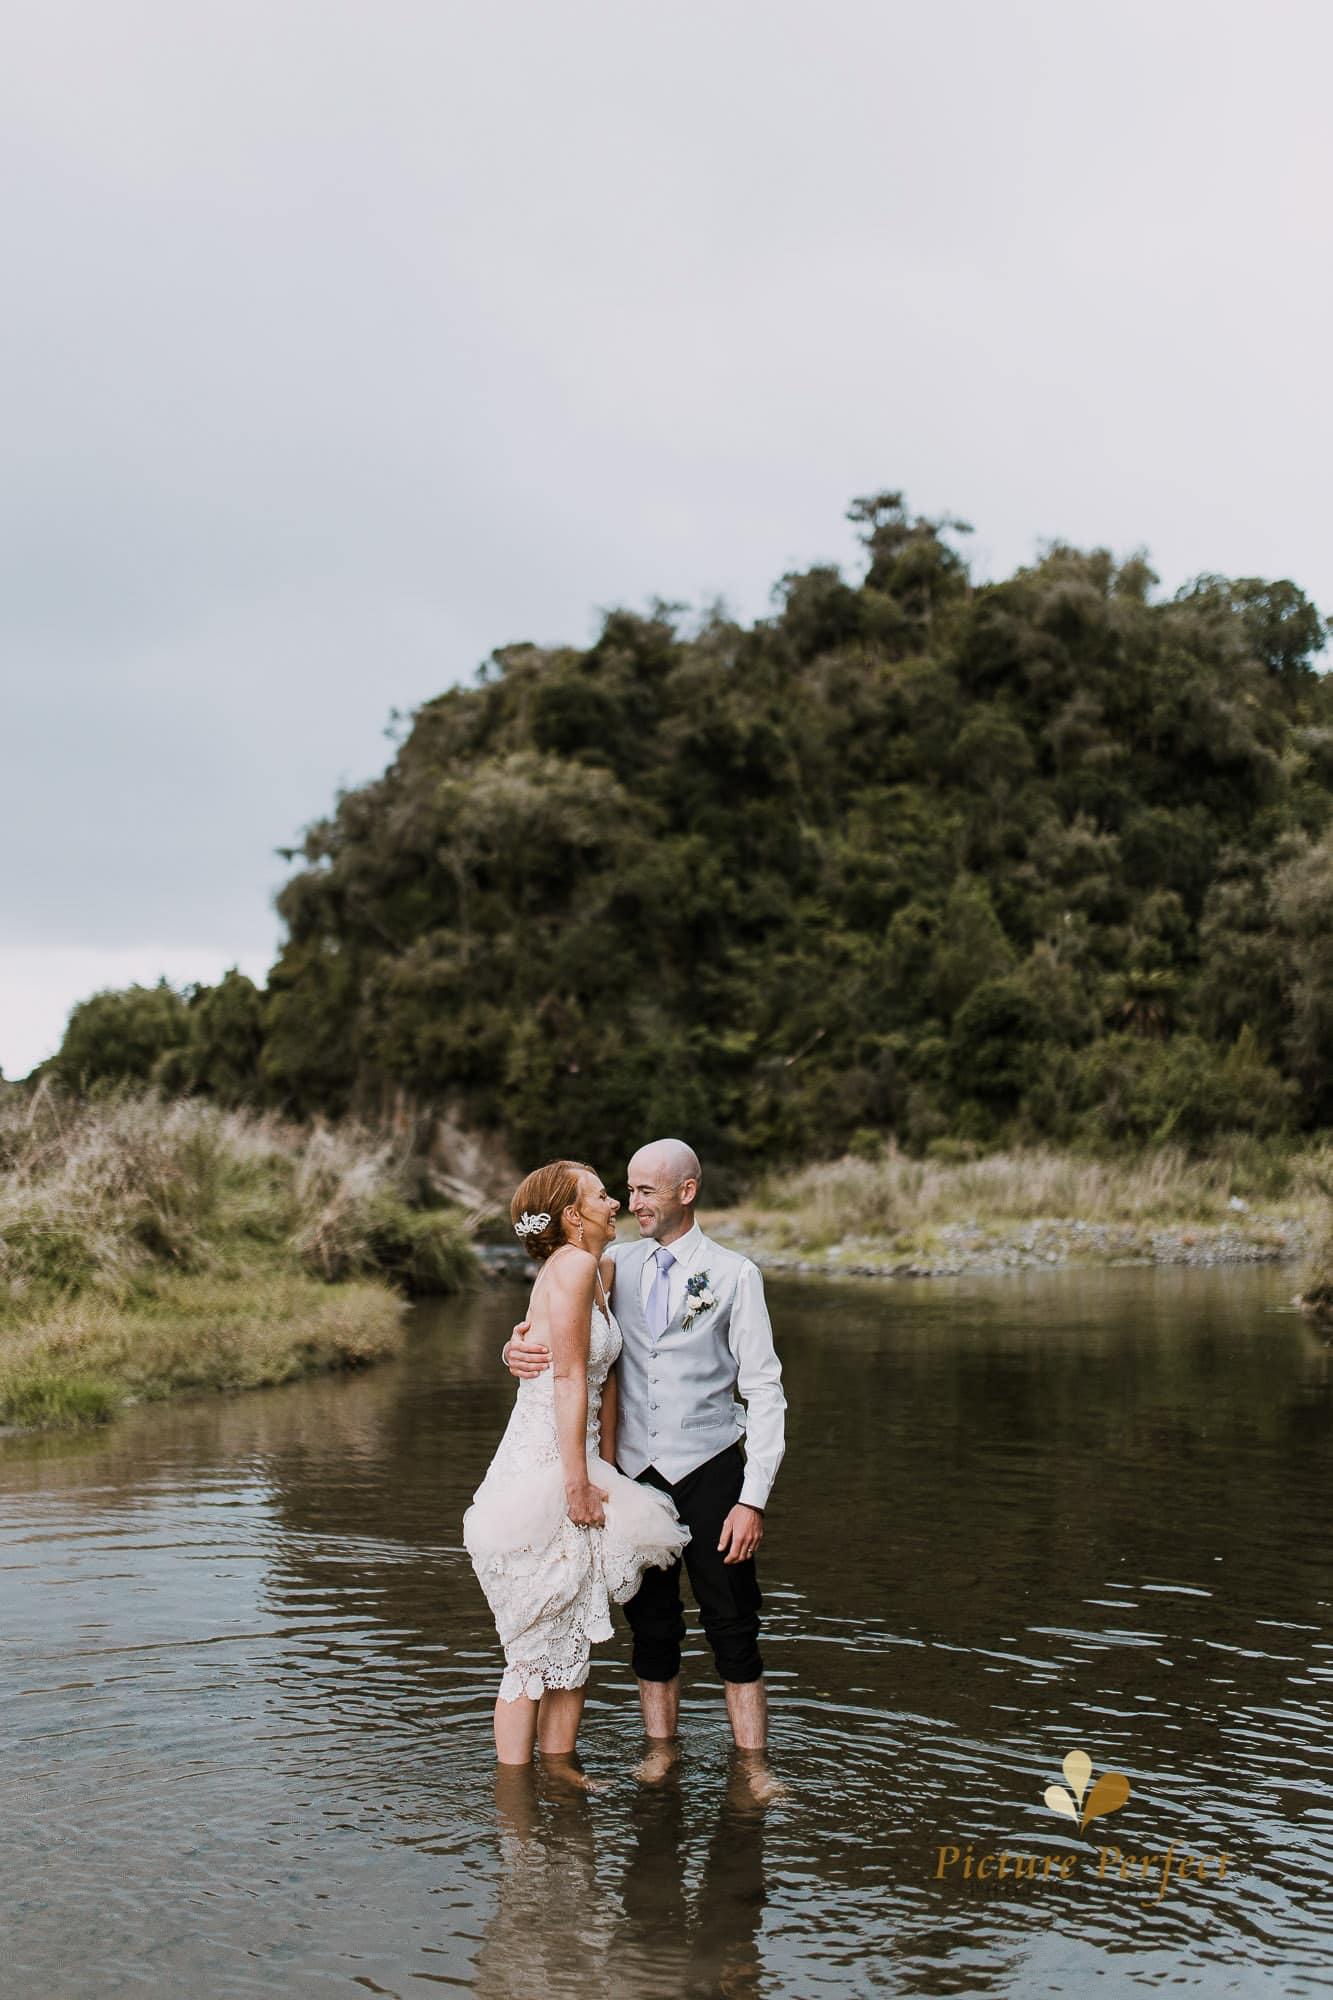 Freya and Matt fun wedding photography 0310